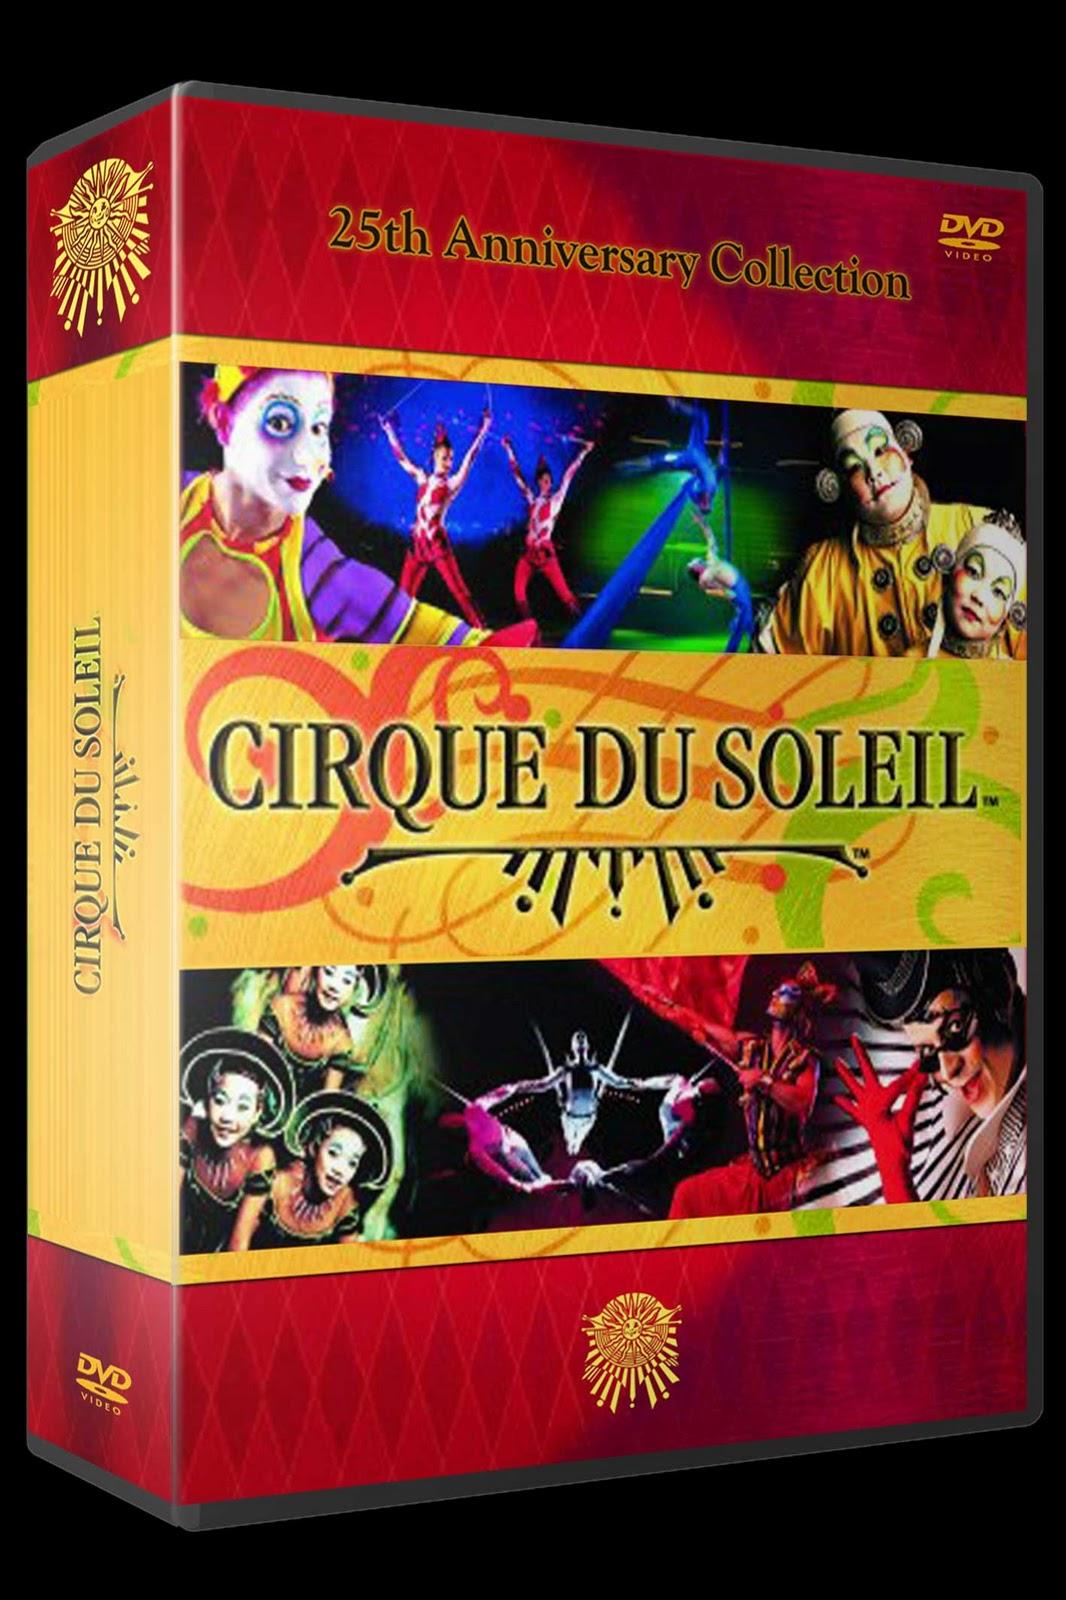 Cirque Du Soleil Dvd: PLANET DVD: CIRQUE DU SOLEIL 25 ANNIVERSARY COLLECTION